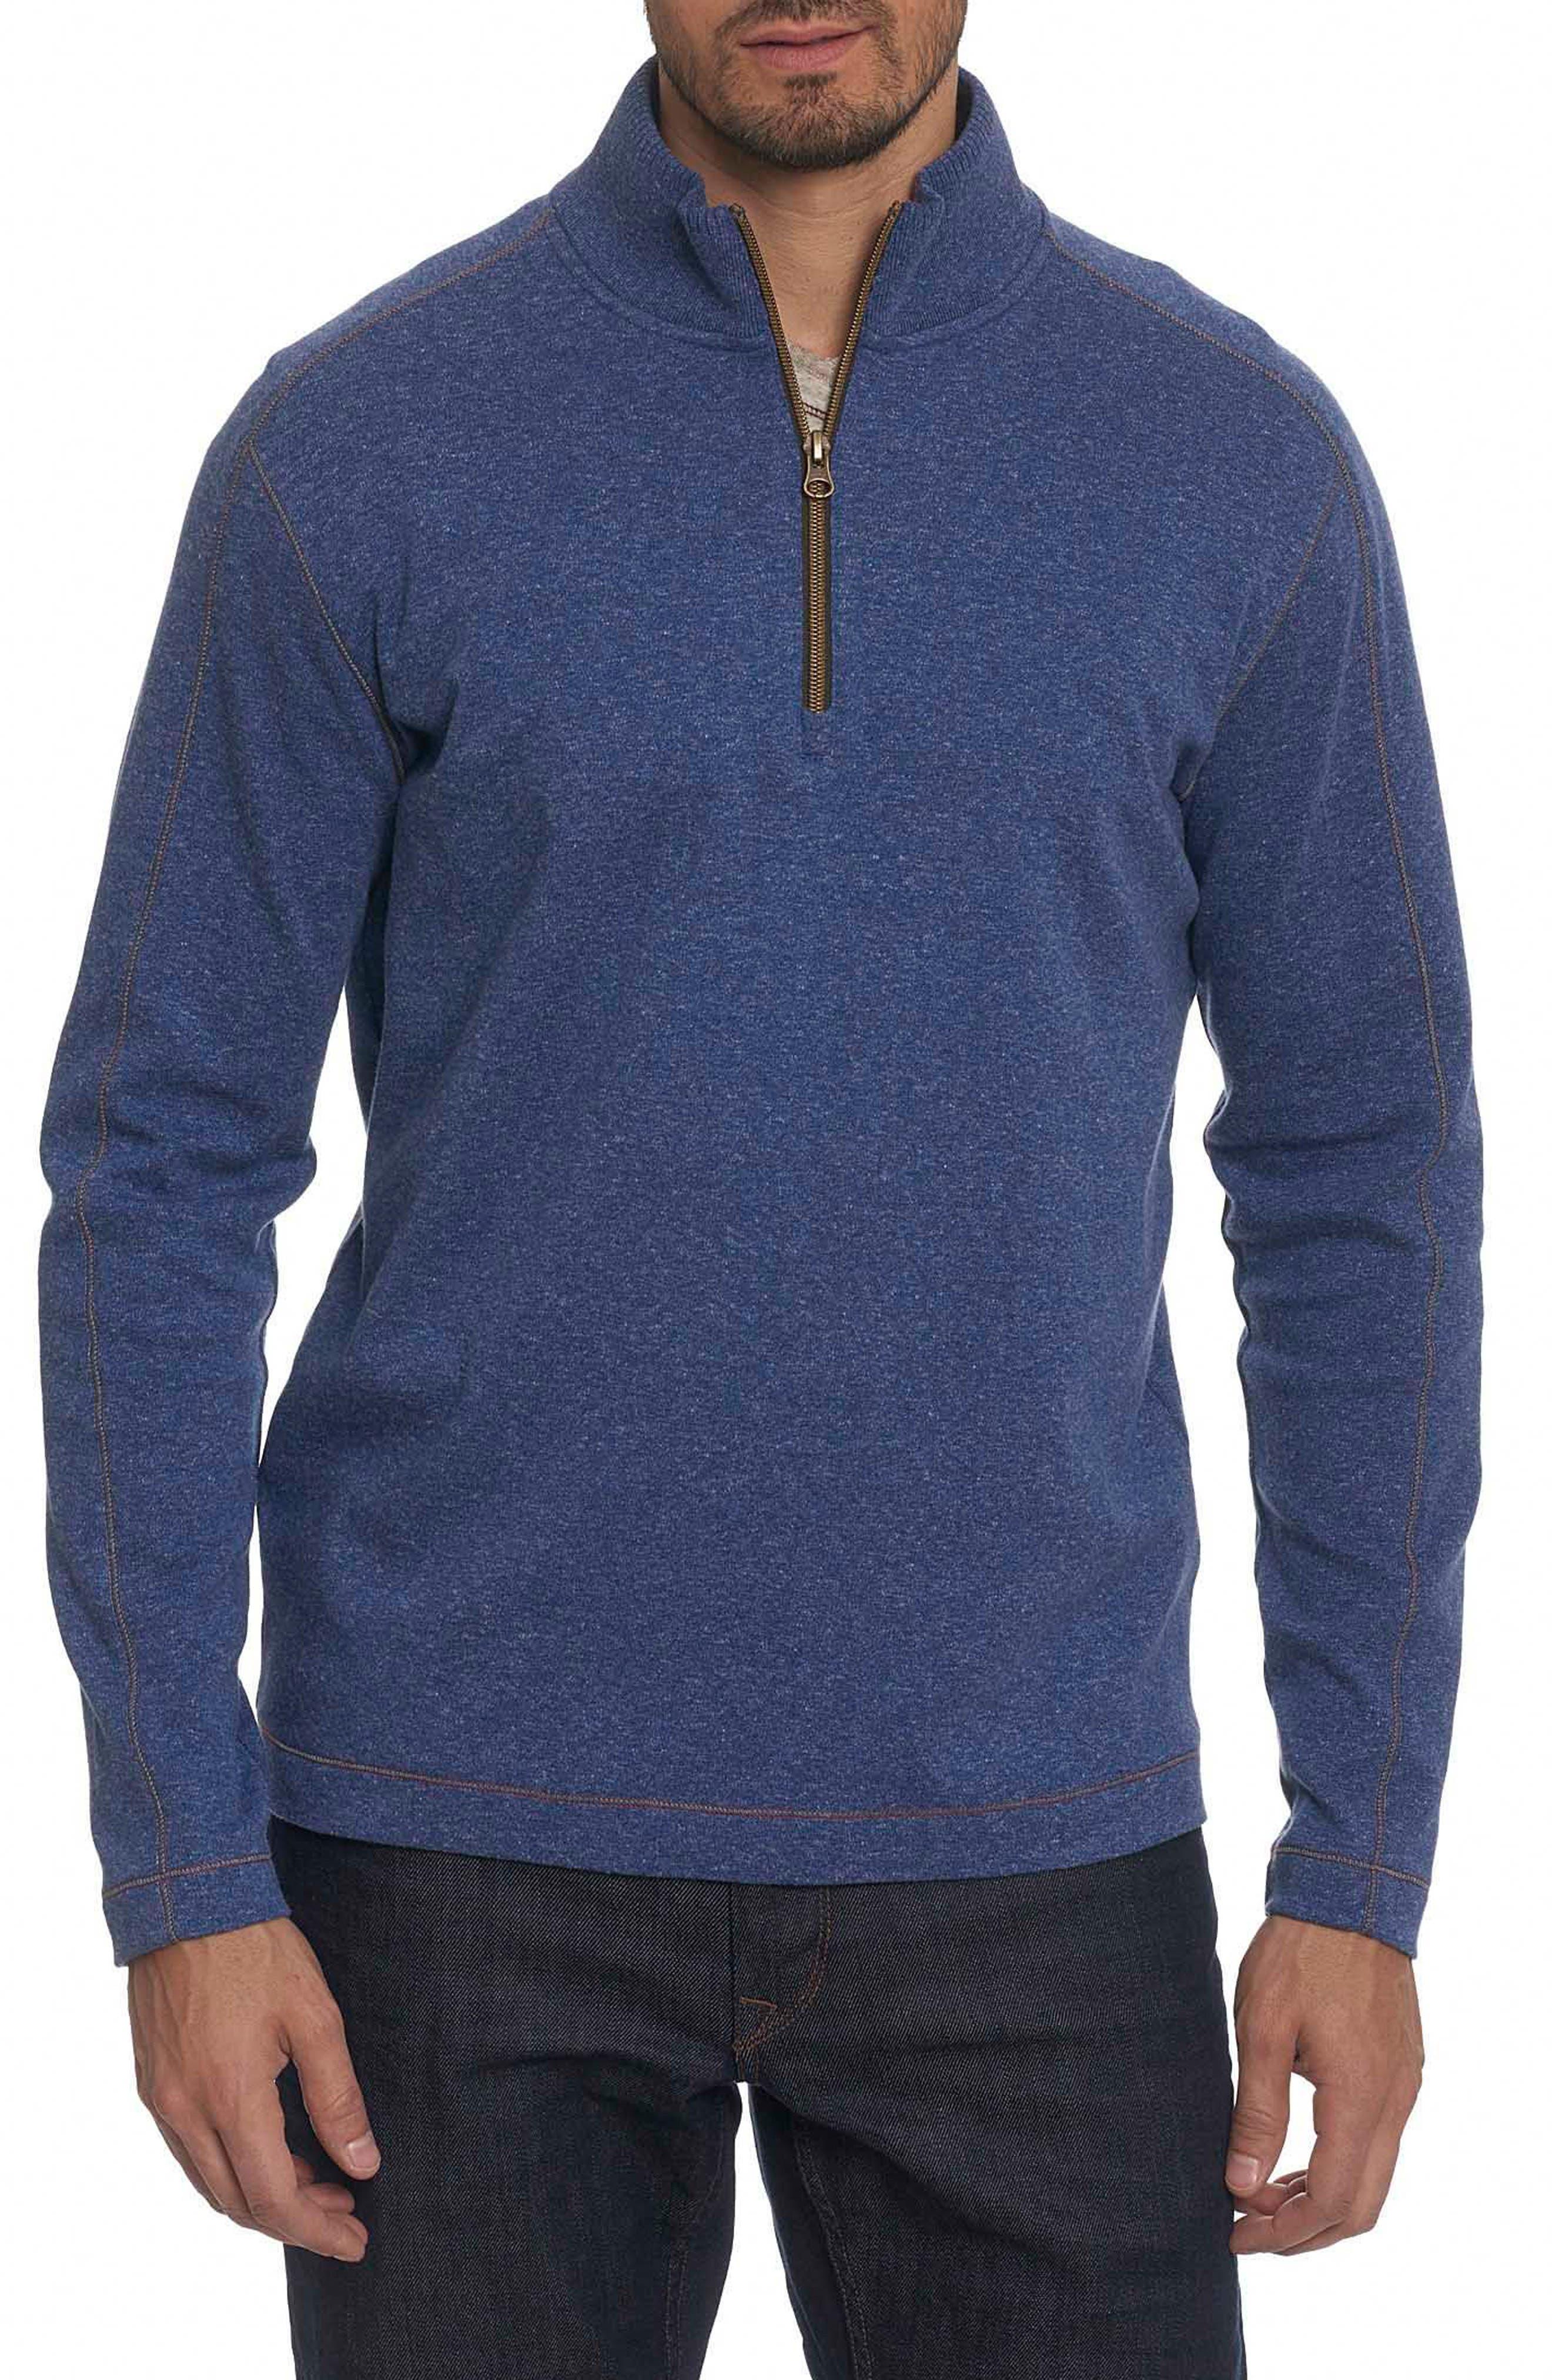 Main Image - Robert Graham 'Elia' Regular Fit Quarter Zip Pullover